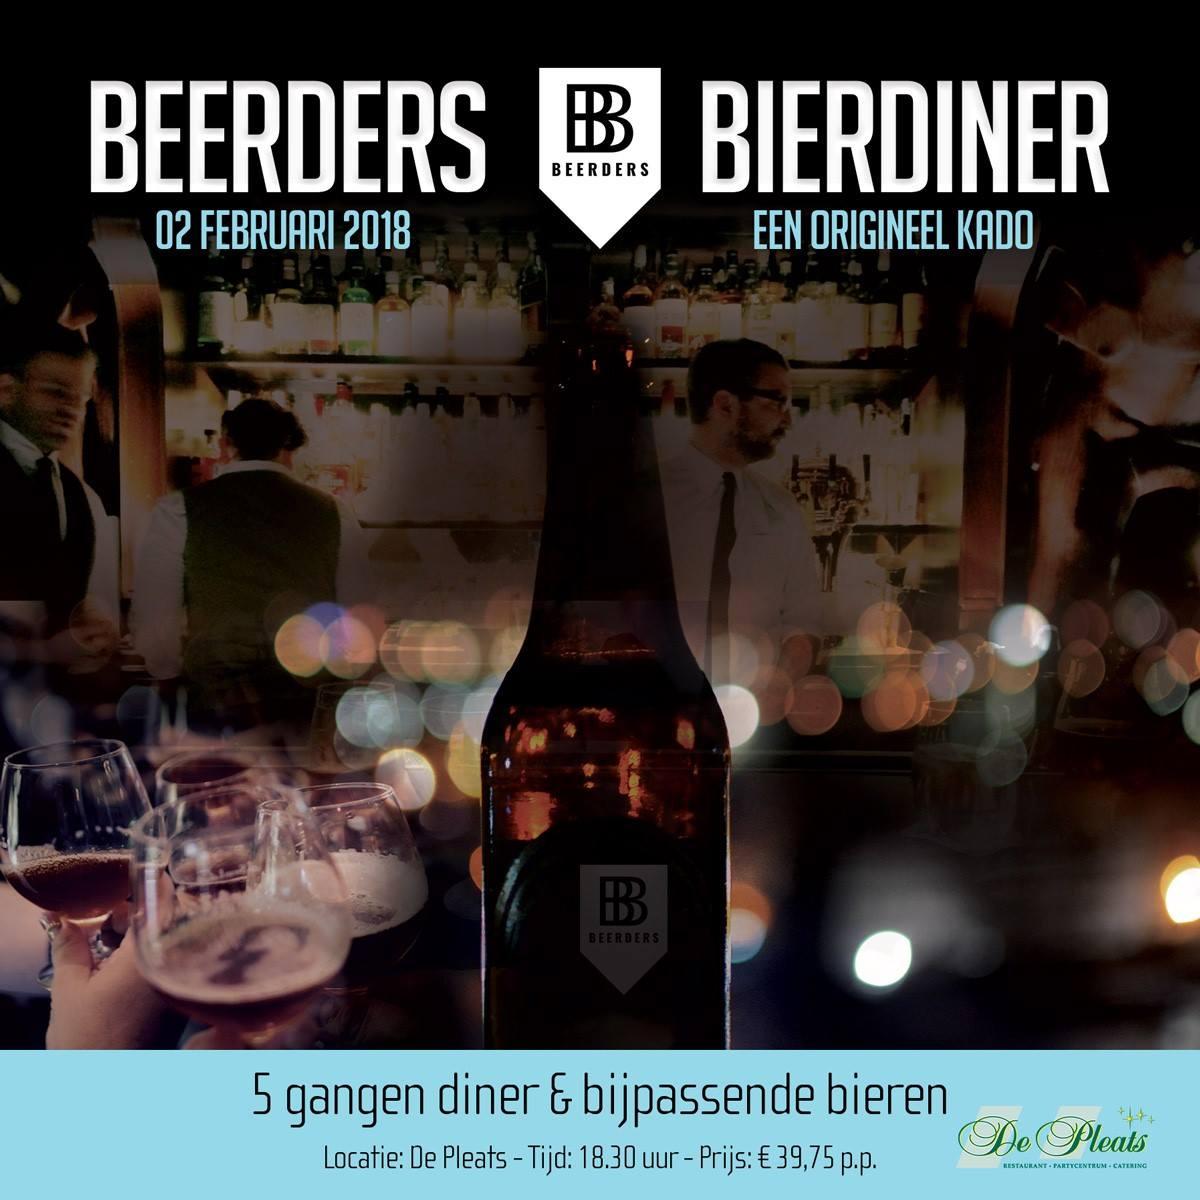 Beerders bierdiner